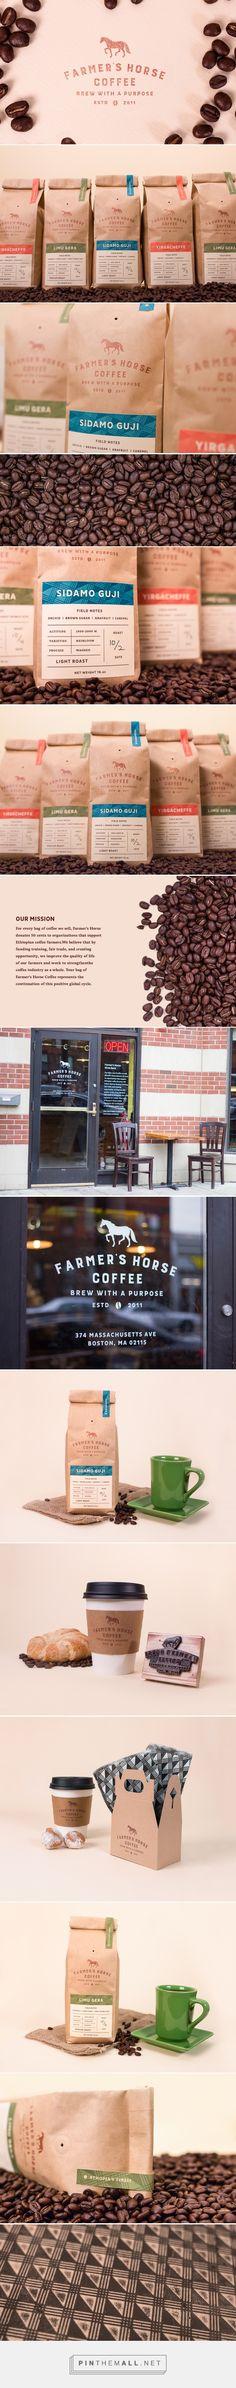 Farmeru0027s Horse Coffee 28 best Agri images